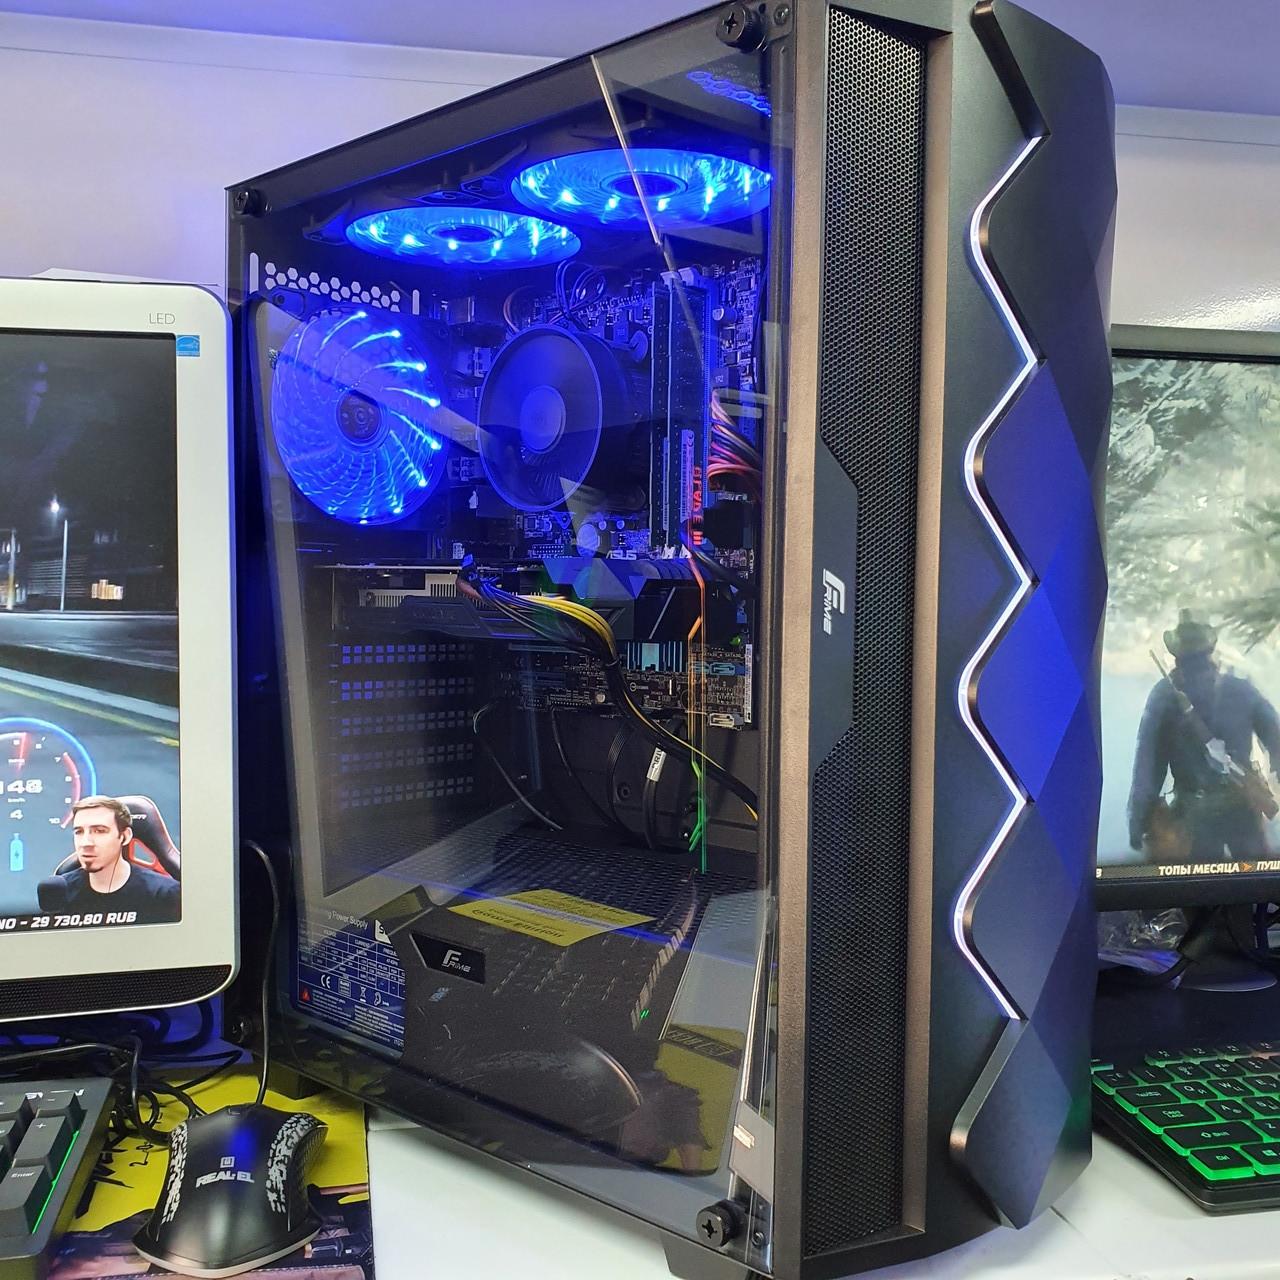 Системный блок Game Edition Frime(Intel Core i7-37708x3.90Ghz/8Gb DDR3/SSD 240Gb/GTX 1060 6 Gb GDDR5))